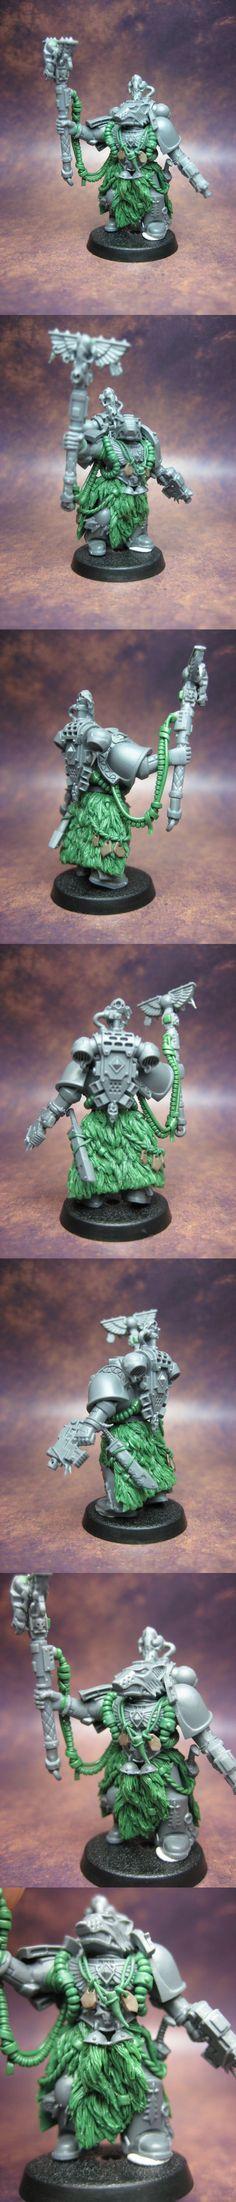 Space Wolves - Rune Priest